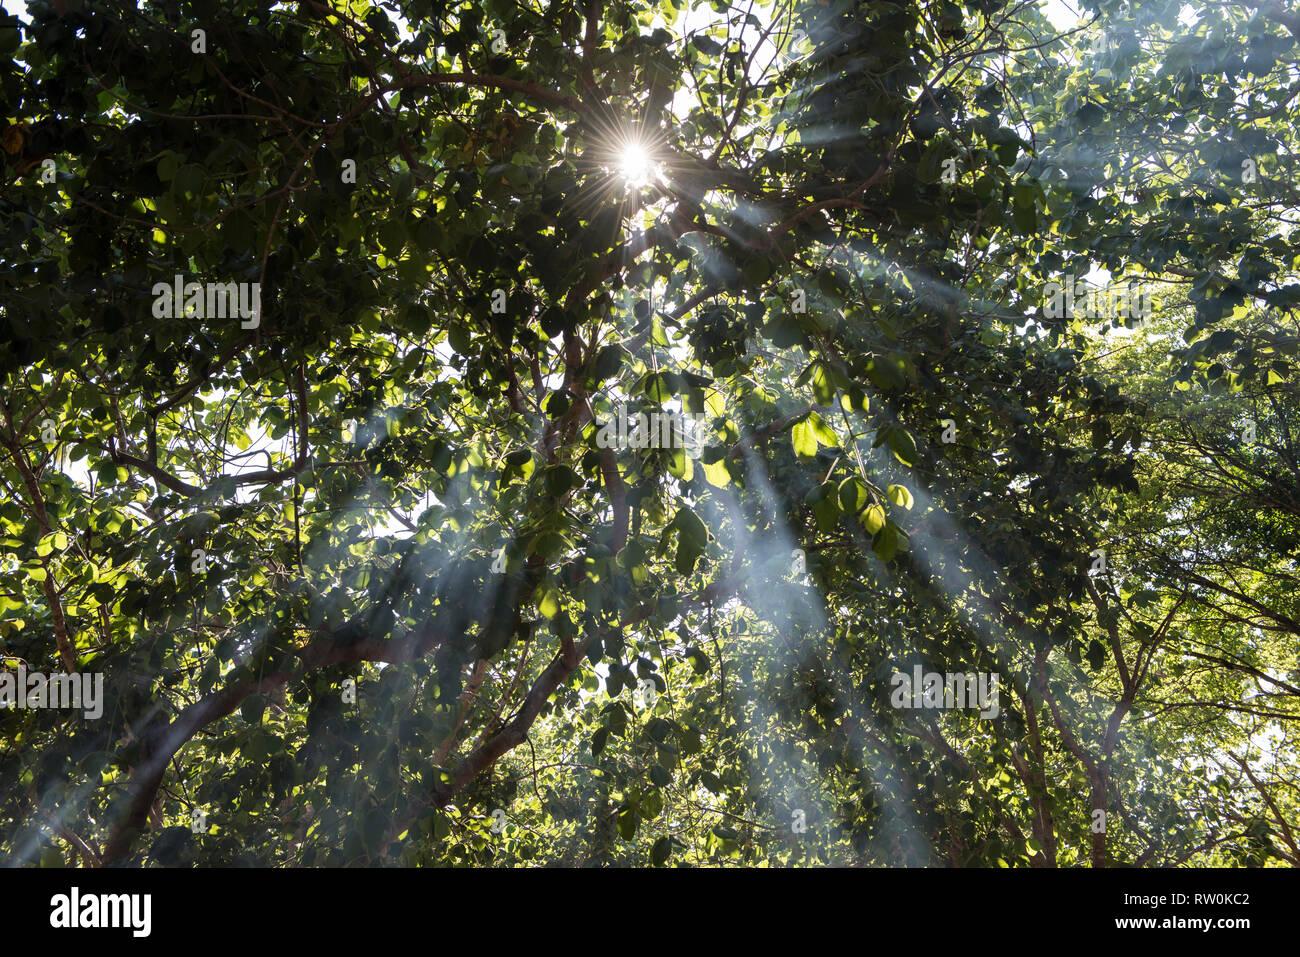 Piaraçu village (Aldeia Piaraçu), Mato Grosso State, Brazil. A sunburst through the trees of the forest. Stock Photo